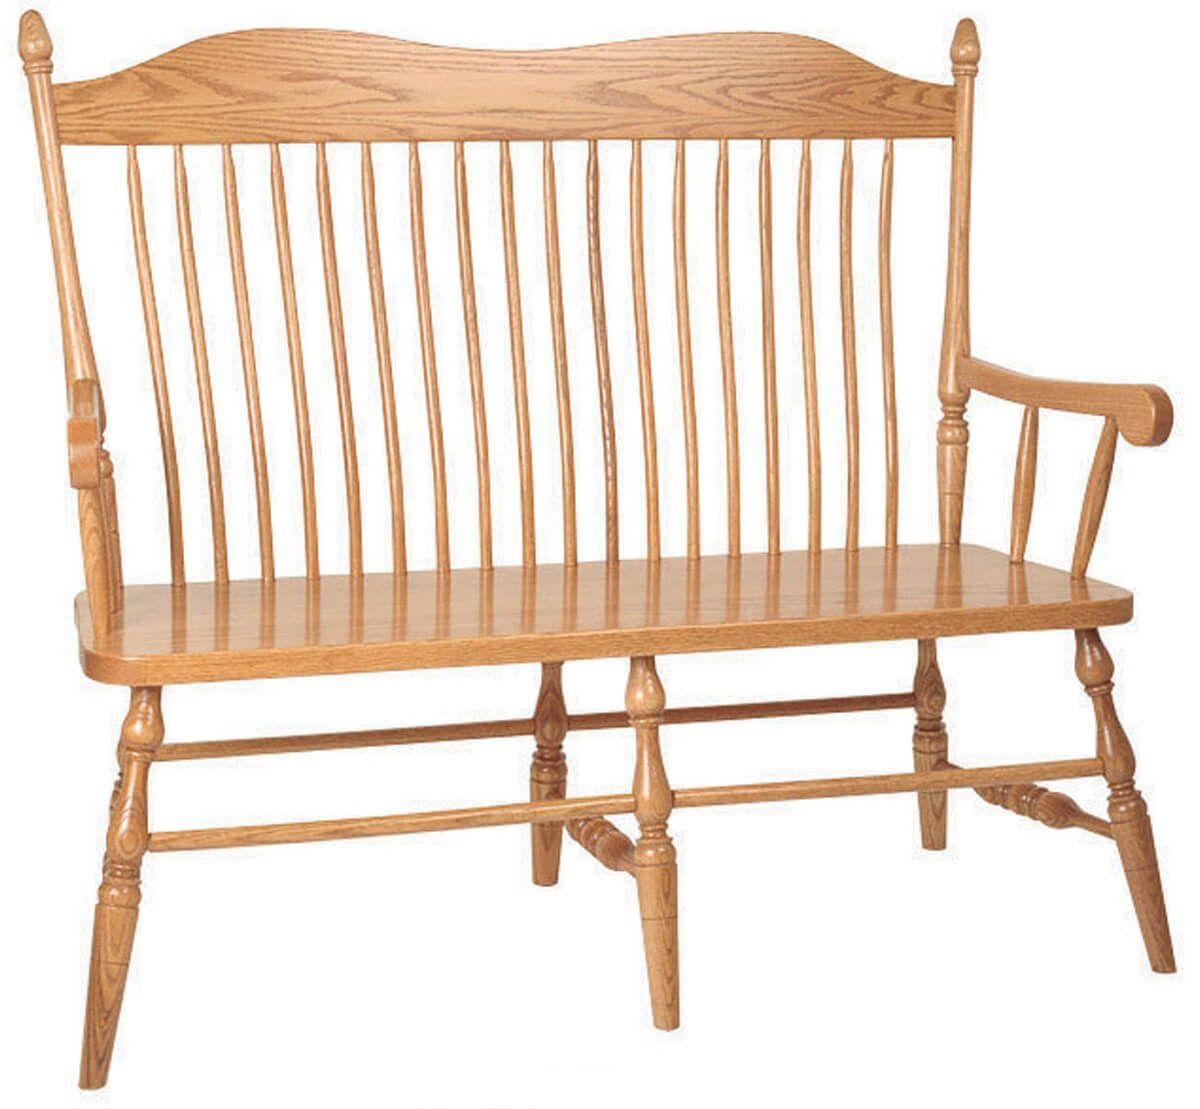 Kittery Oak Spindle Back Bench